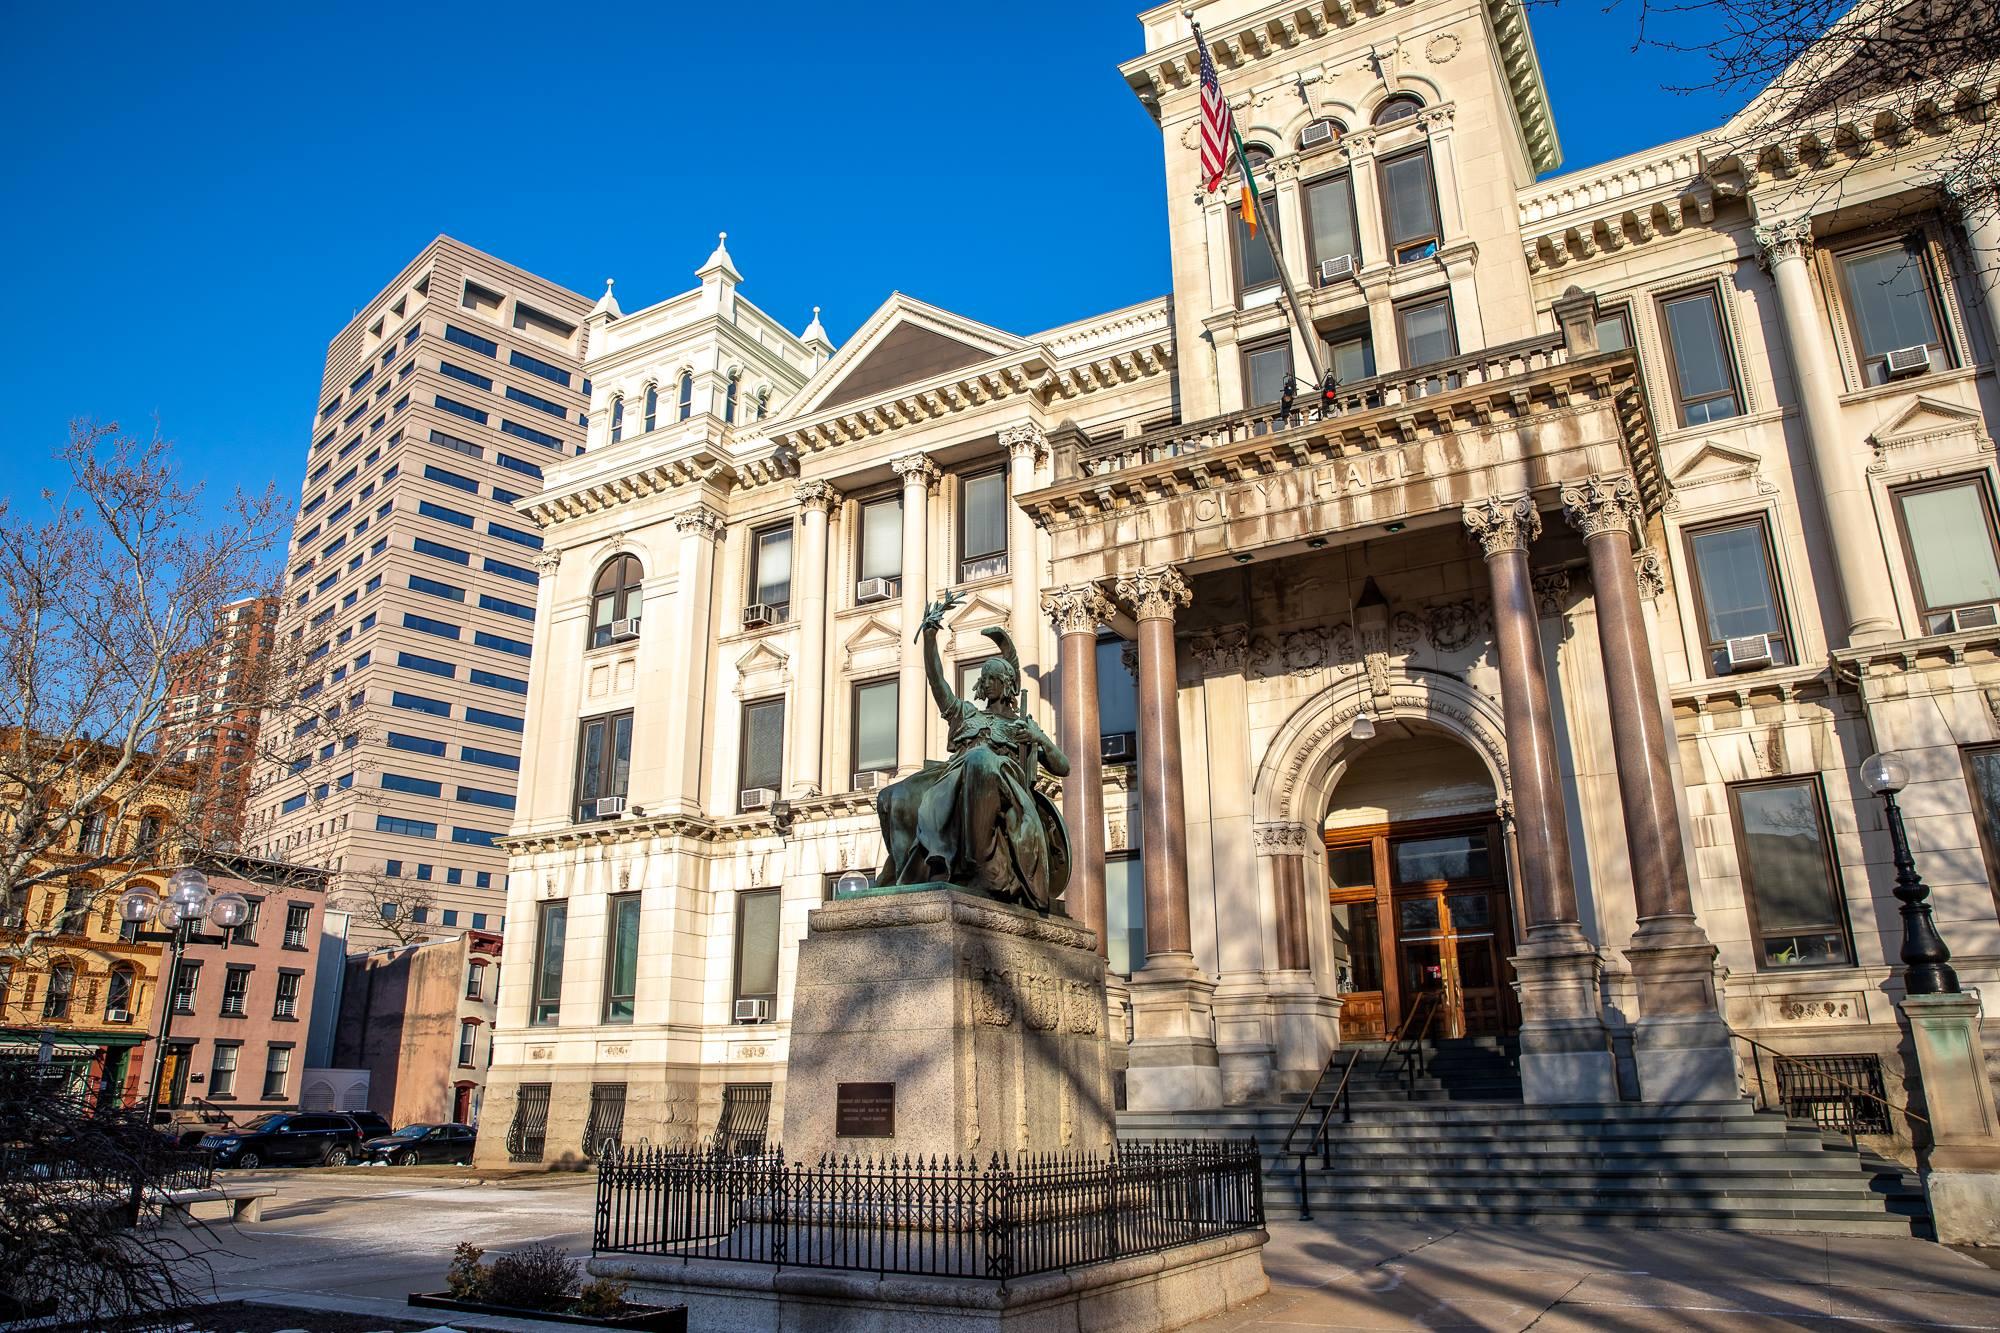 #7 Jersey City Hall